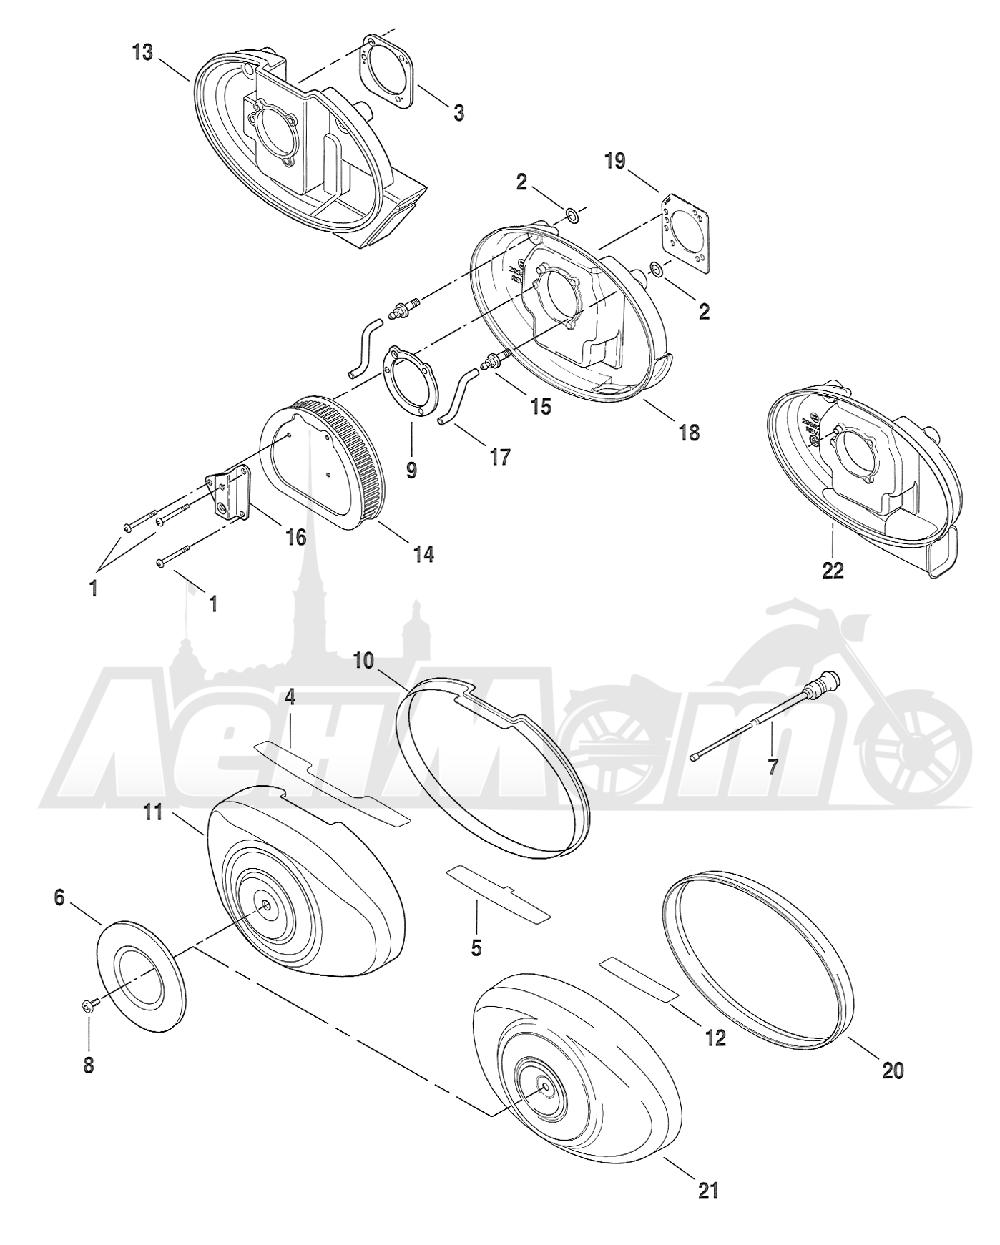 Запчасти для Мотоцикла Harley-Davidson 2005 FXSTB SOFTAIL® (BT) (CARBURATED) Раздел: AIR CLEANER ASSEMBLY W/ ENRICHENER | очиститель воздуха в сборе вместе с ENRICHENER